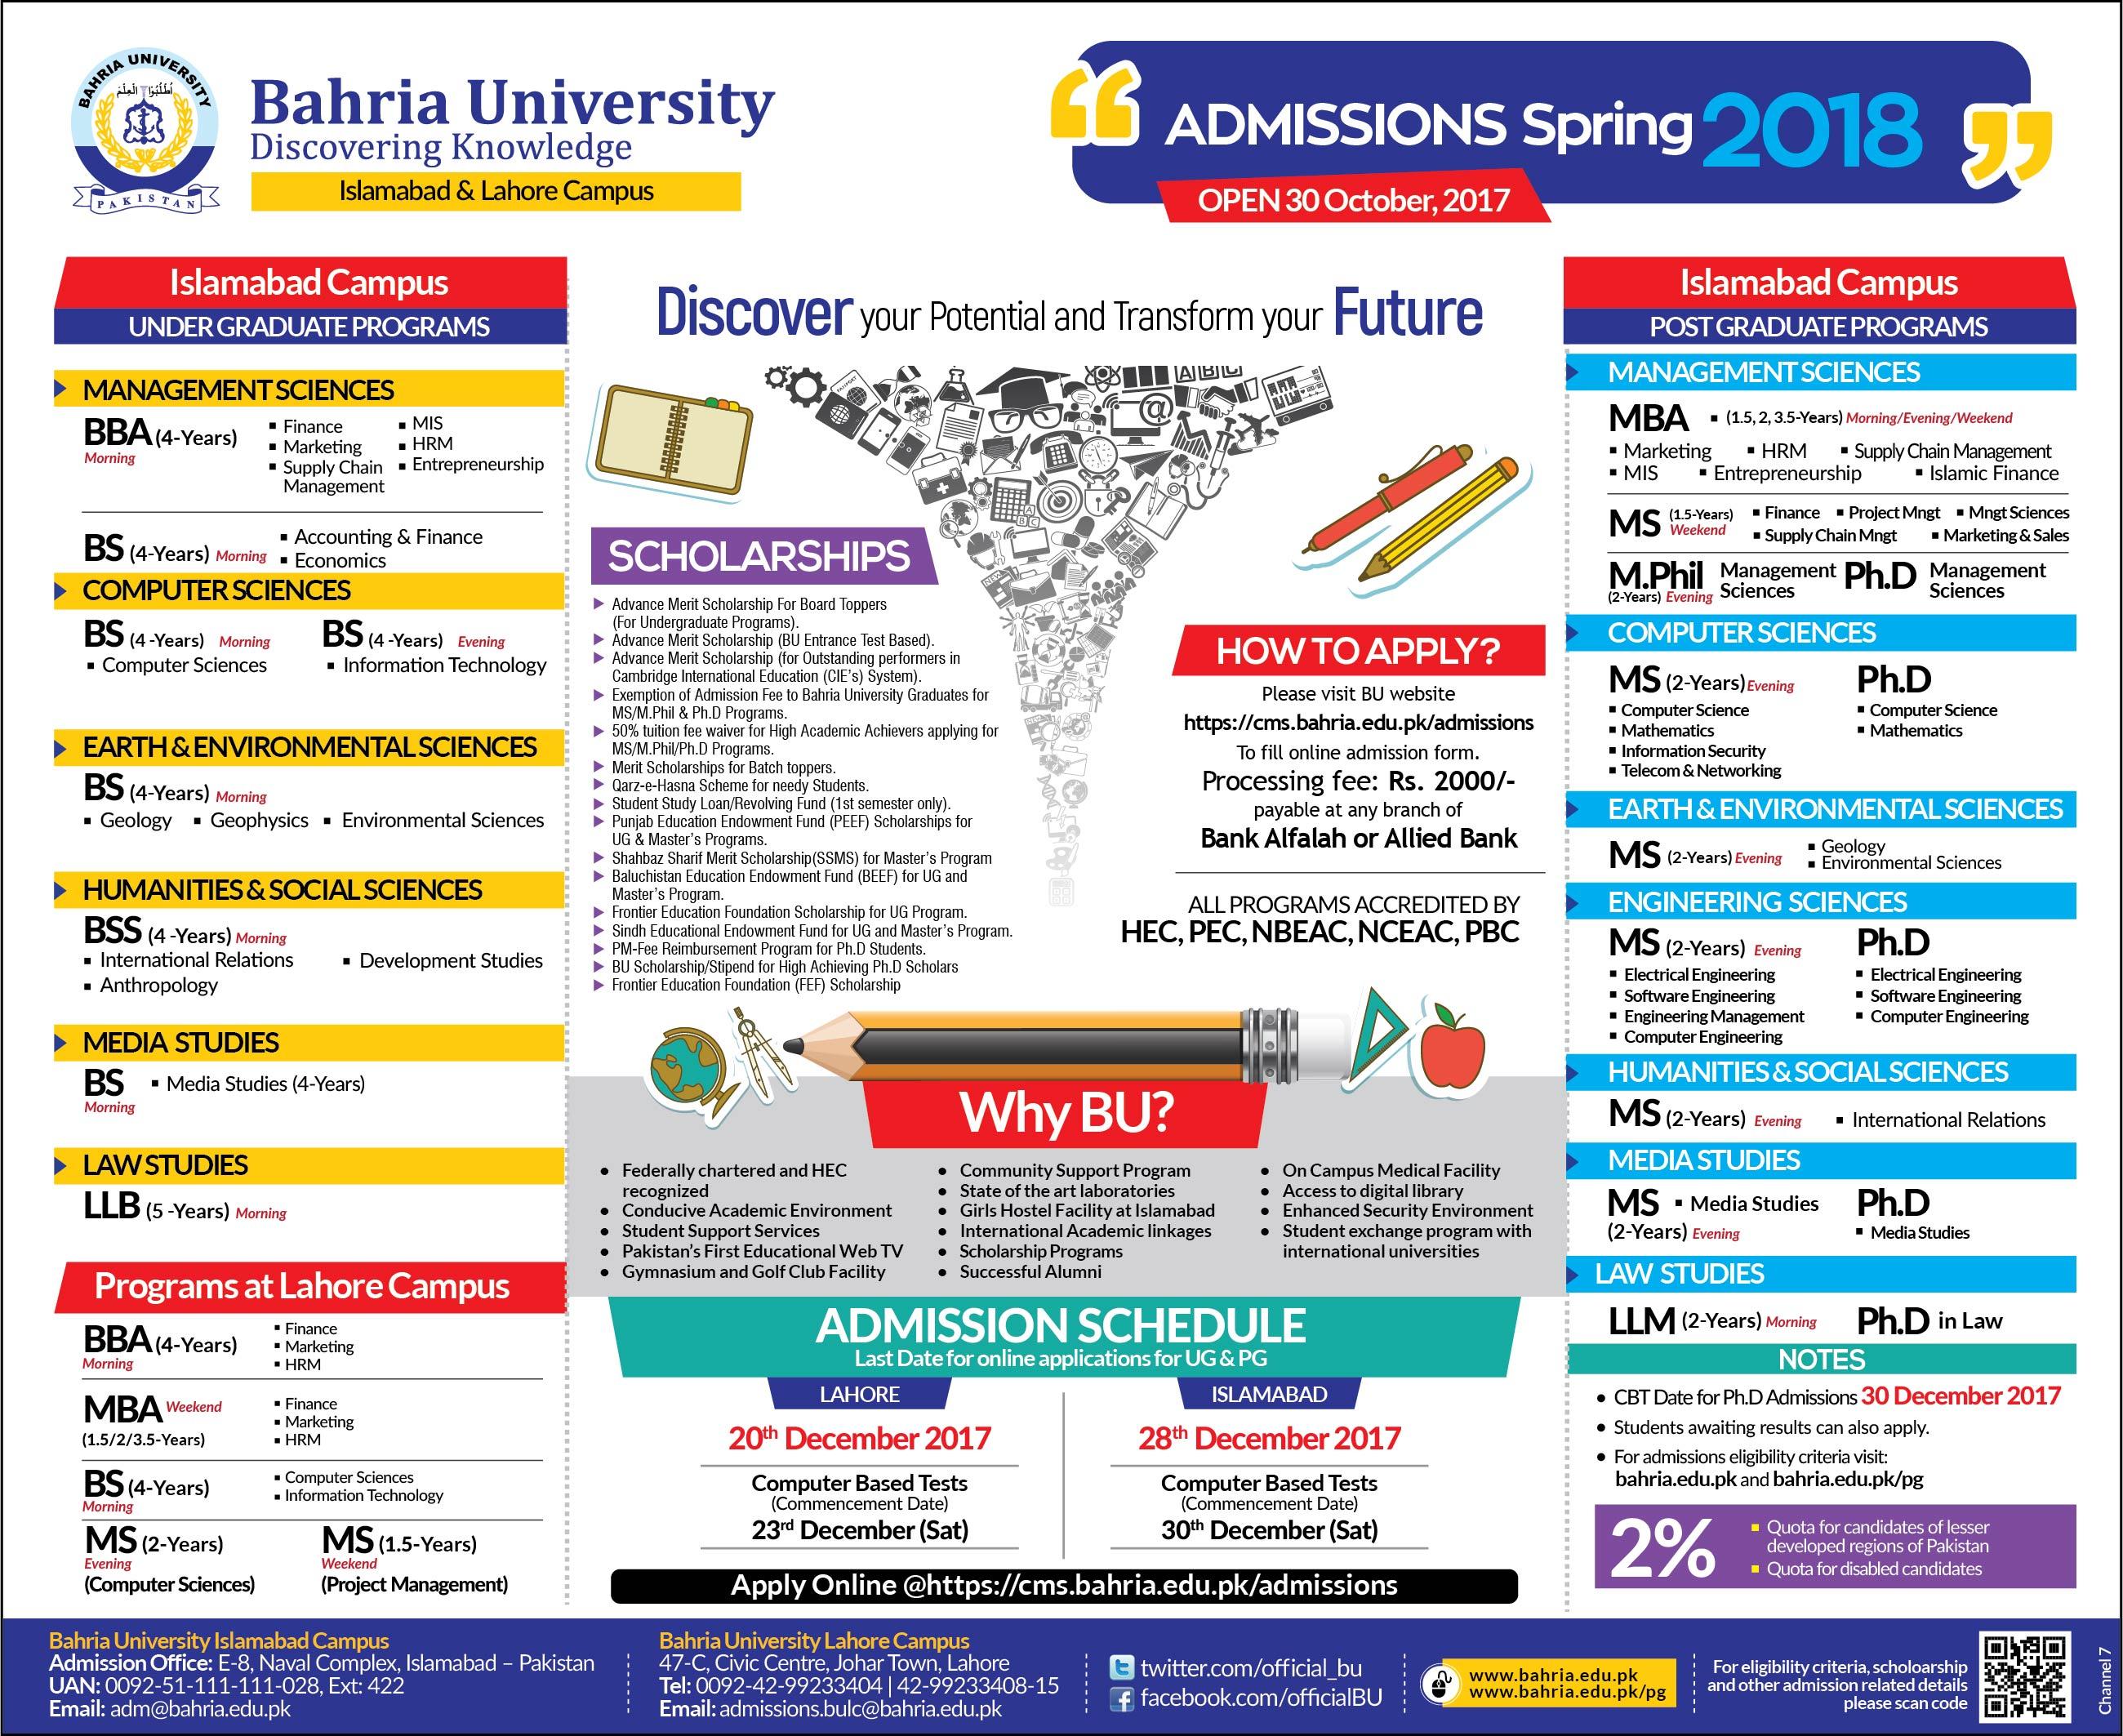 Bahria University Karachi Admissions Spring 2018 Form